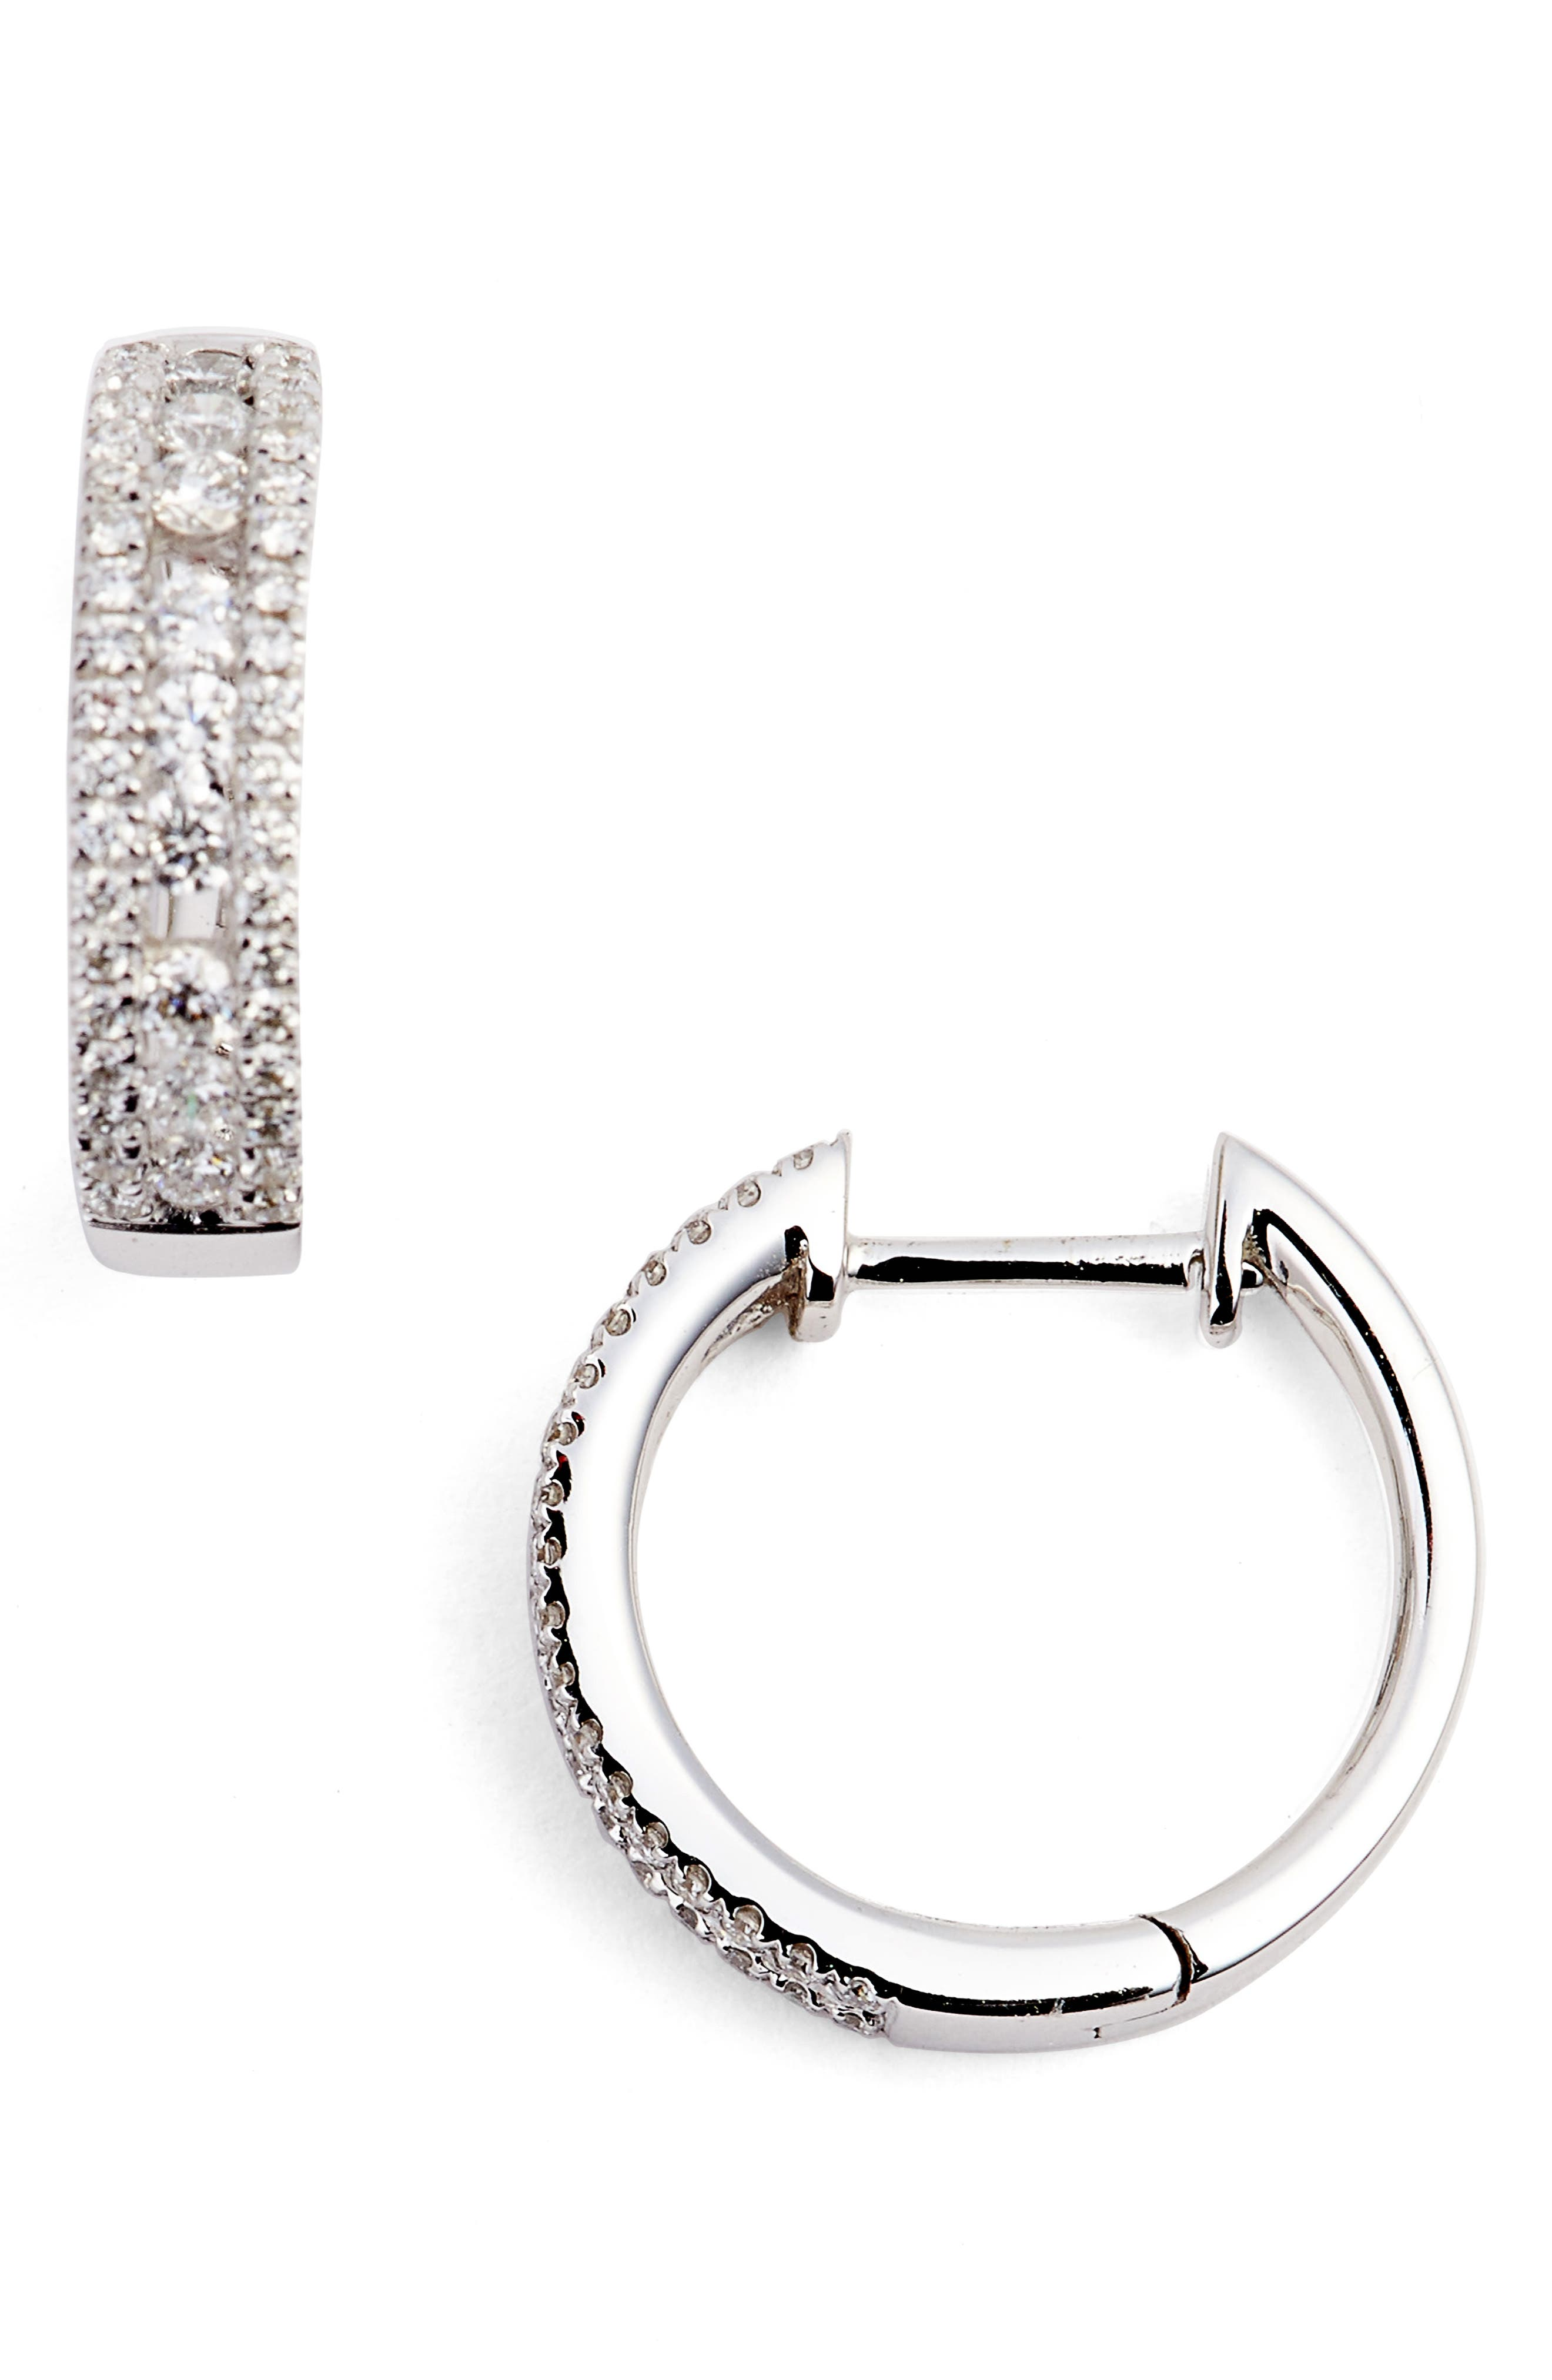 Amara Small Diamond Hoop Earrings,                         Main,                         color, WHITE GOLD